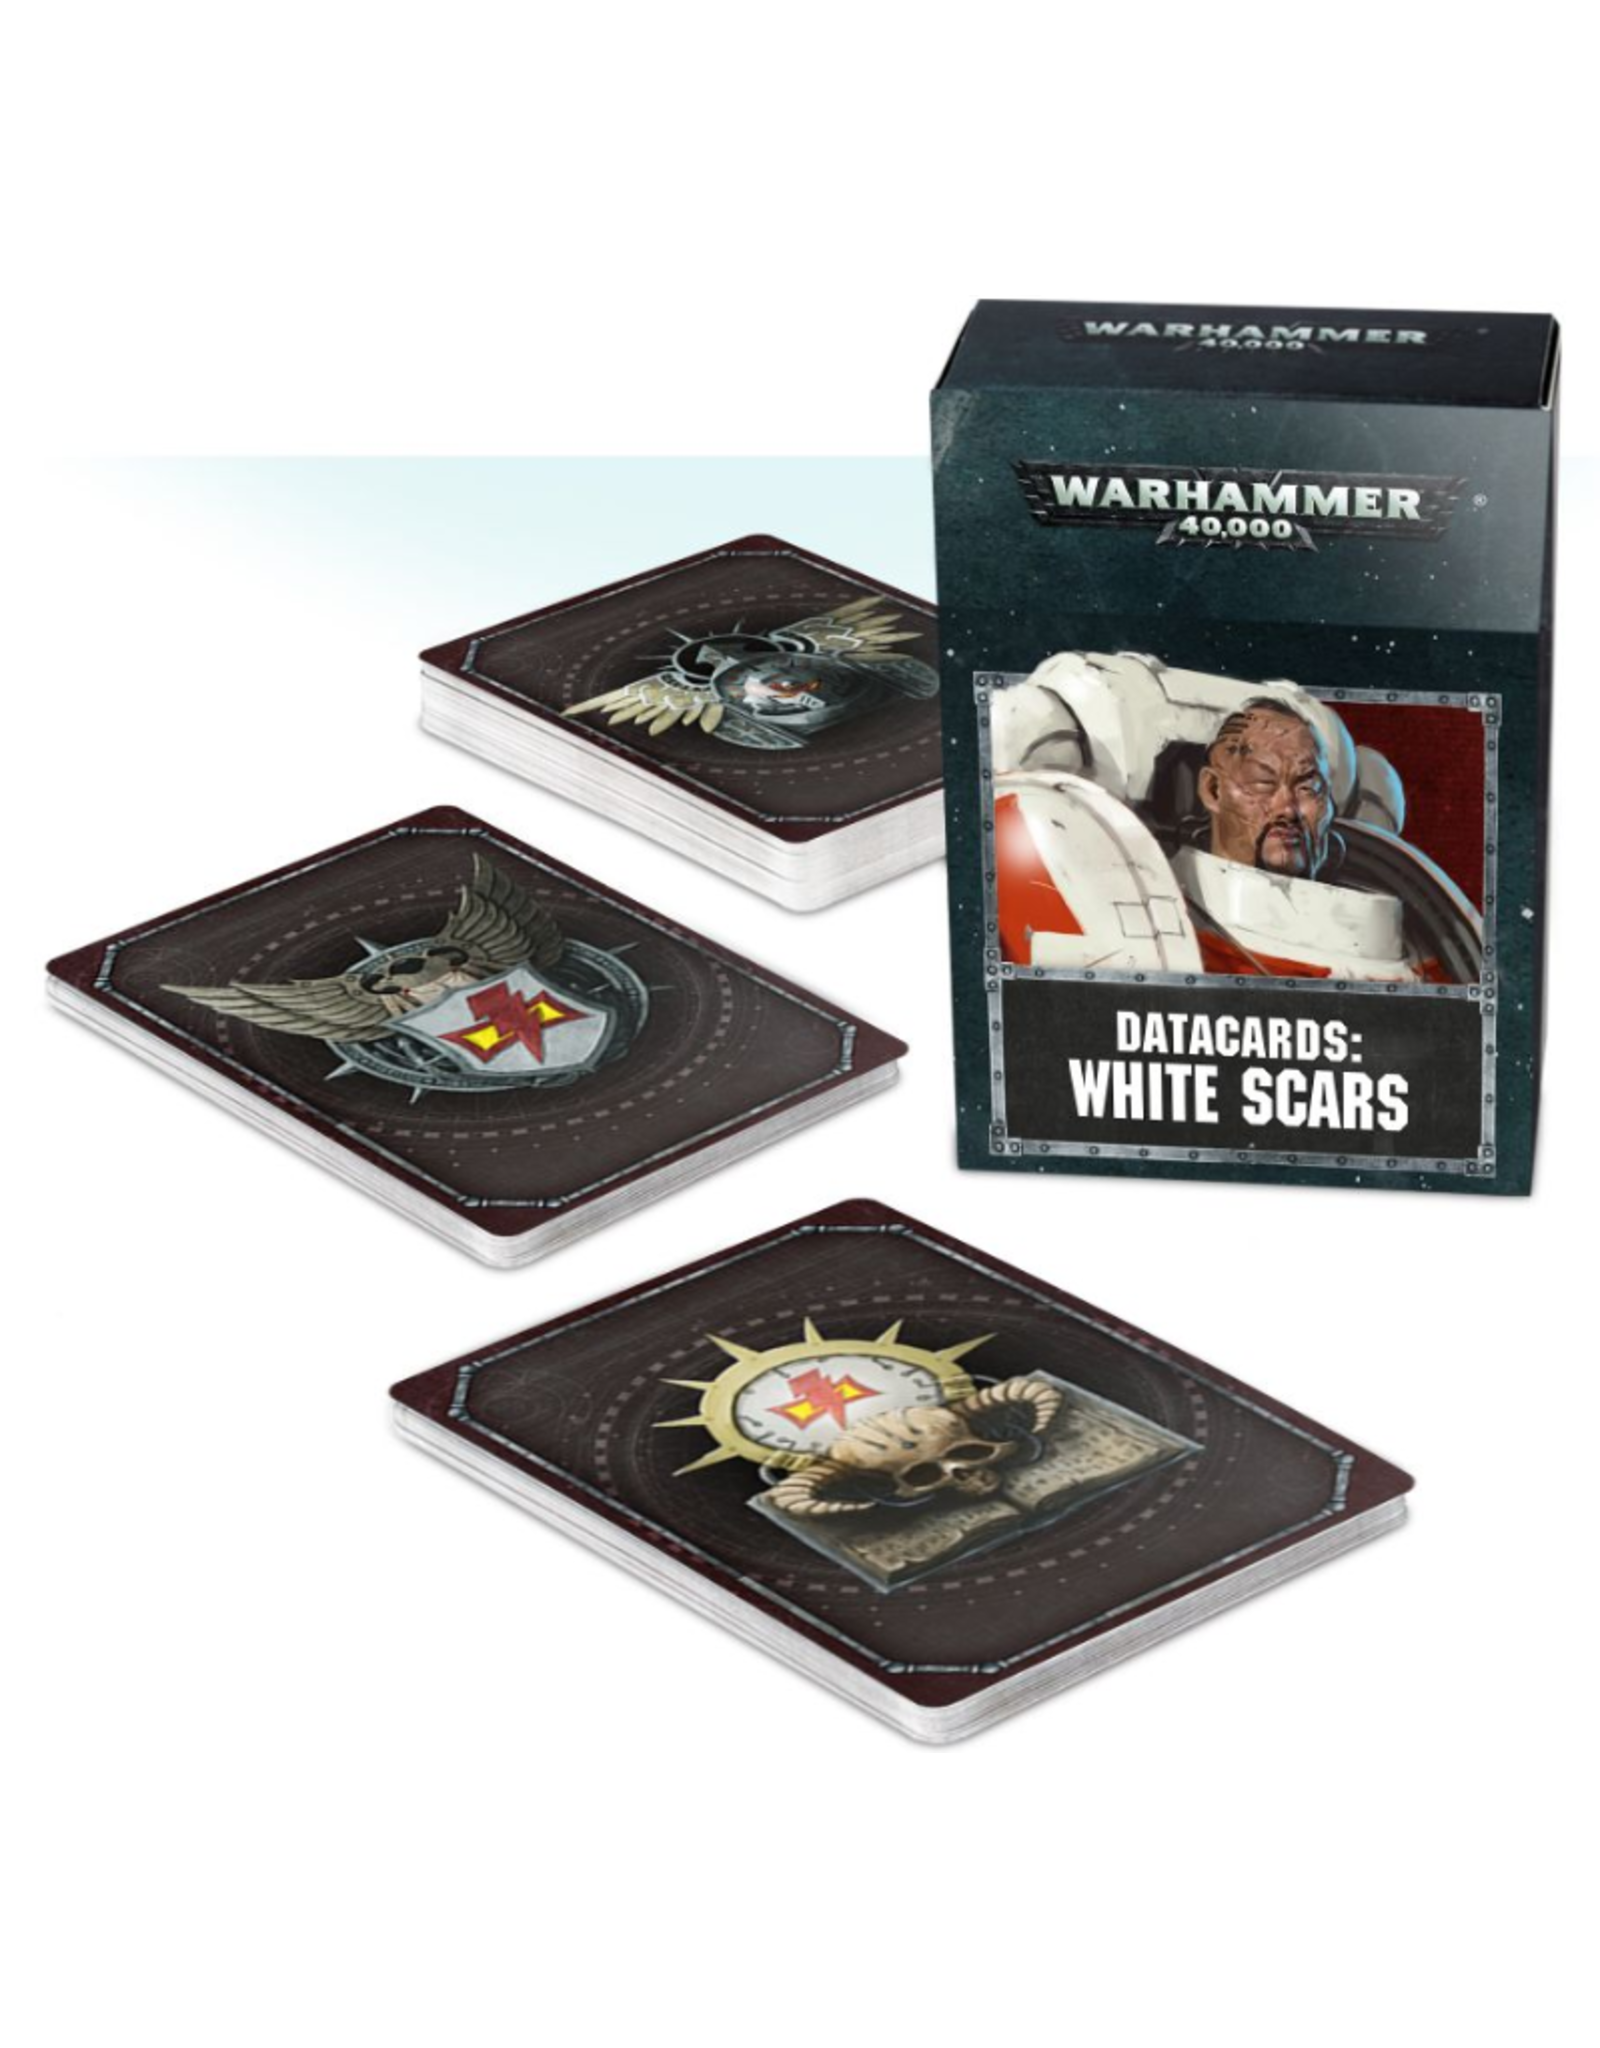 Warhammer 40K Datacards White Scars